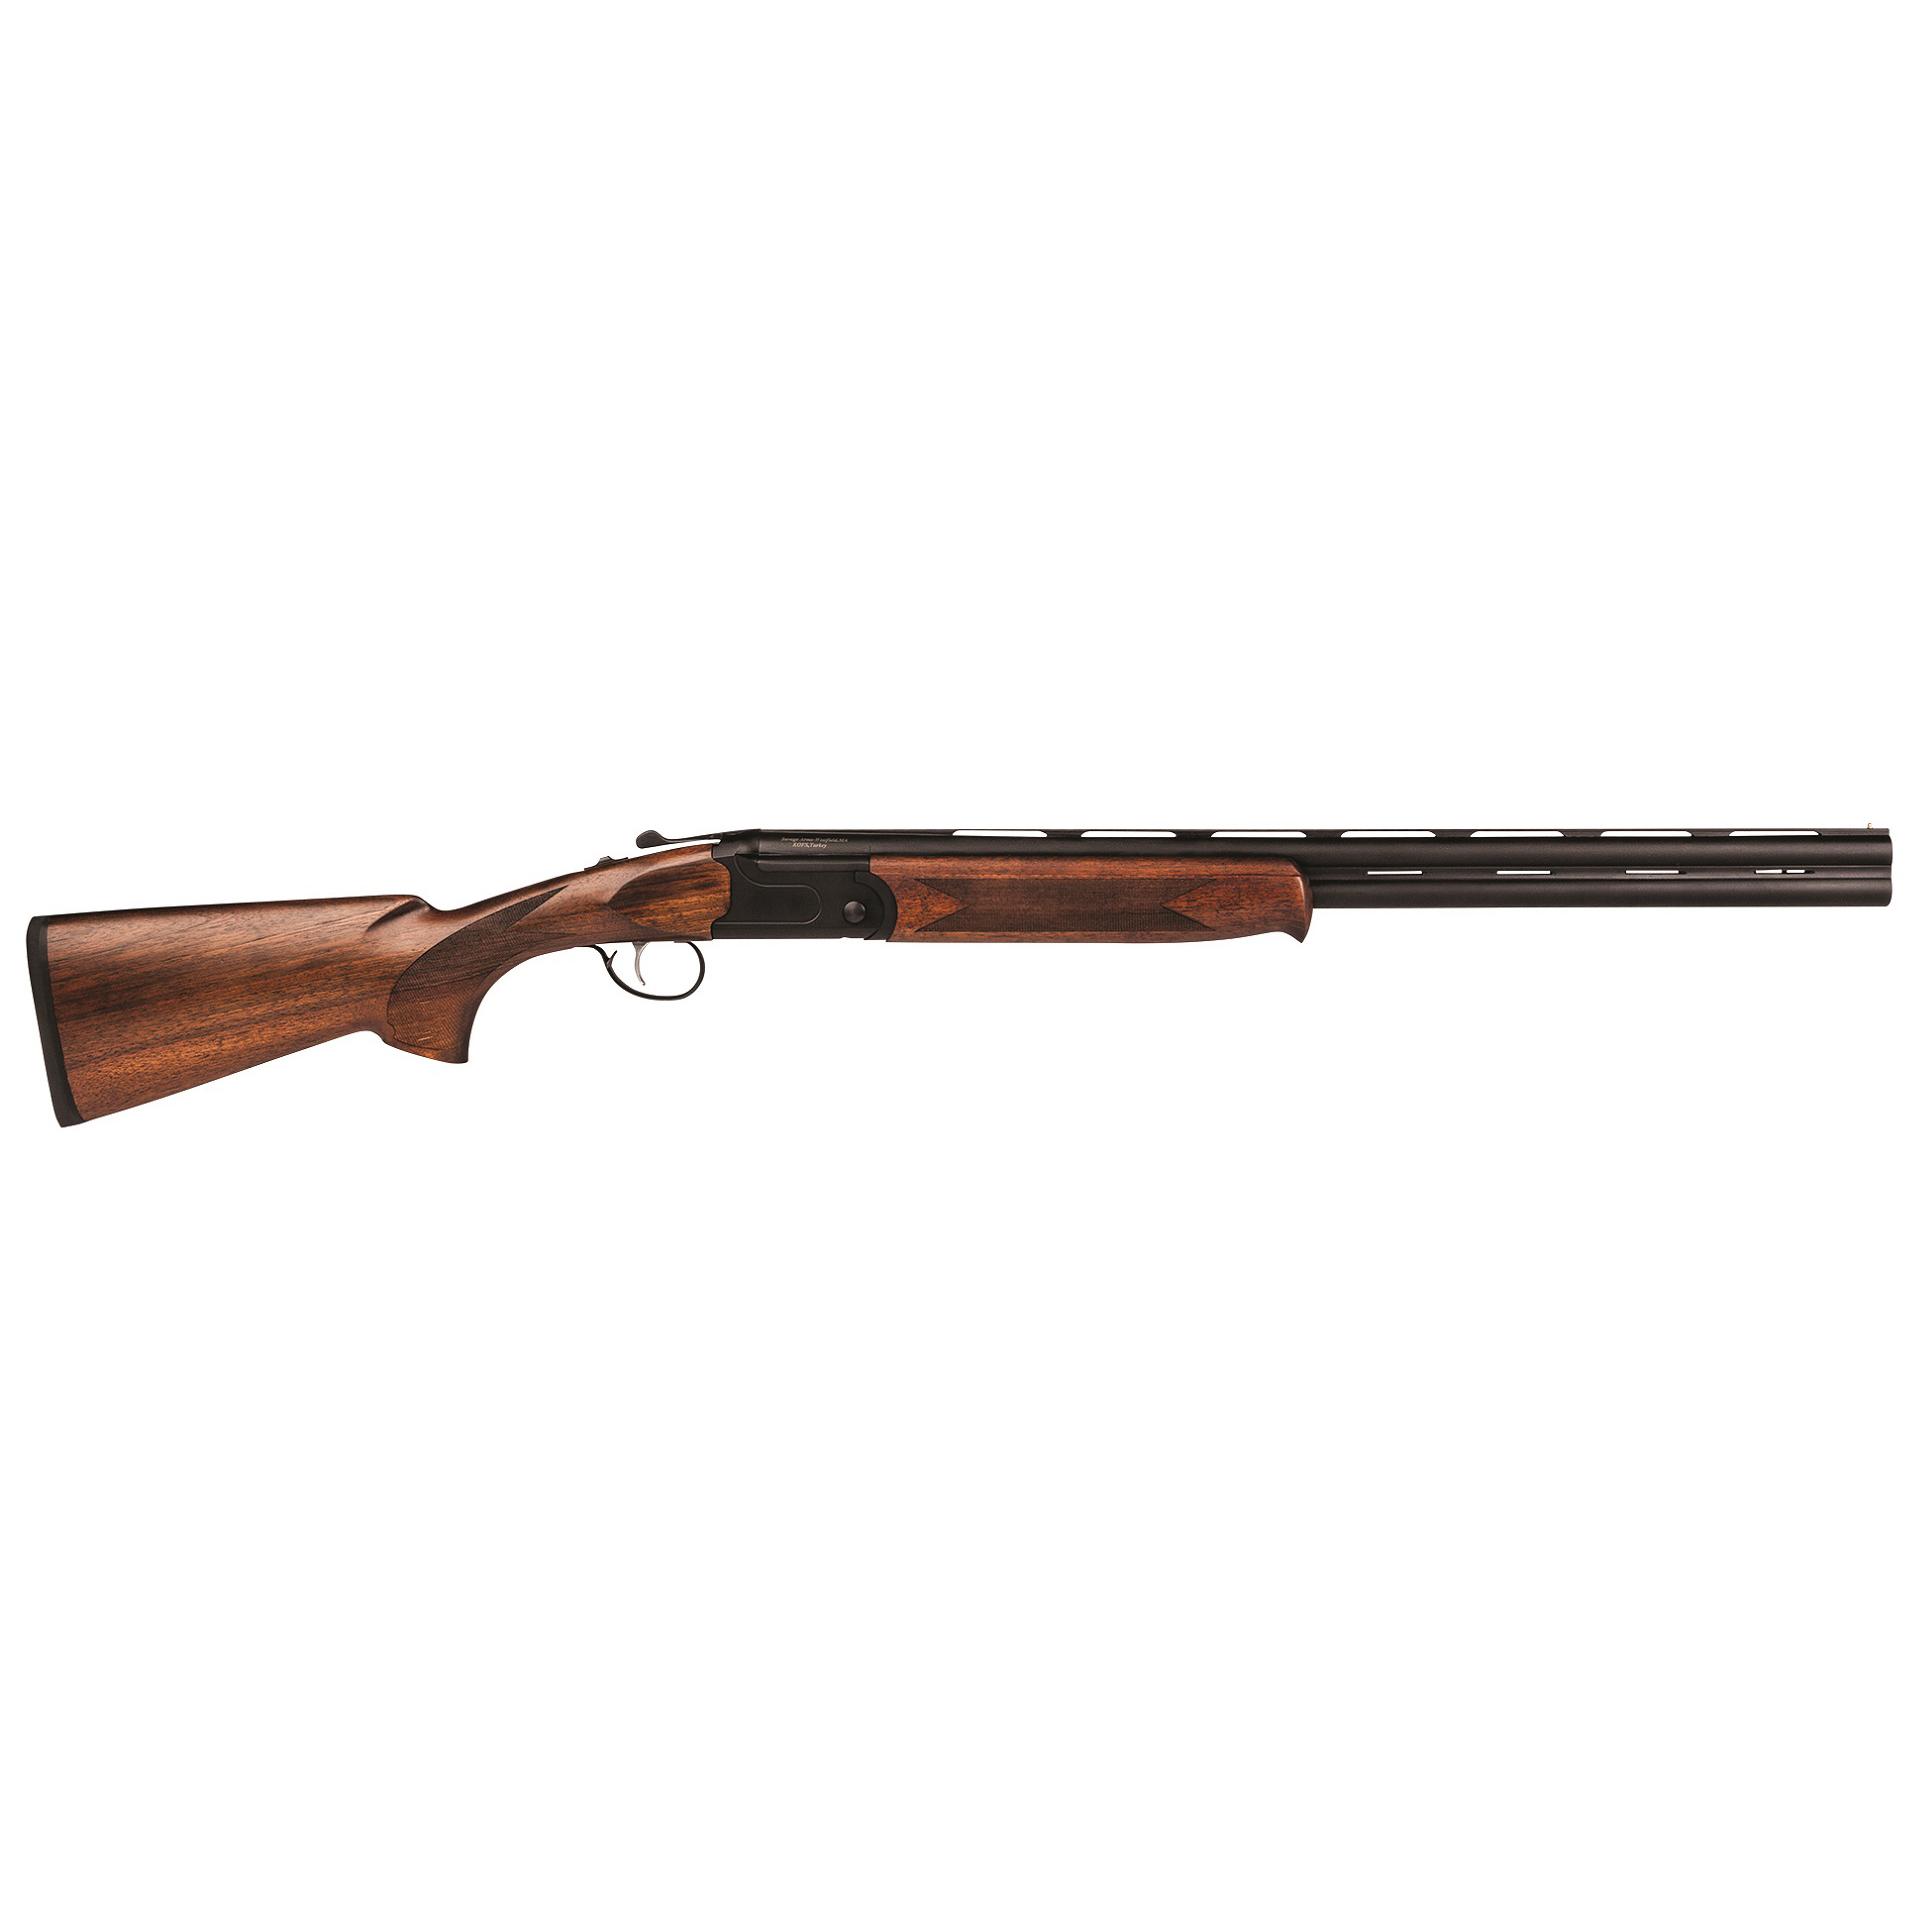 Stevens 555 Compact Shotgun, .410 Bore